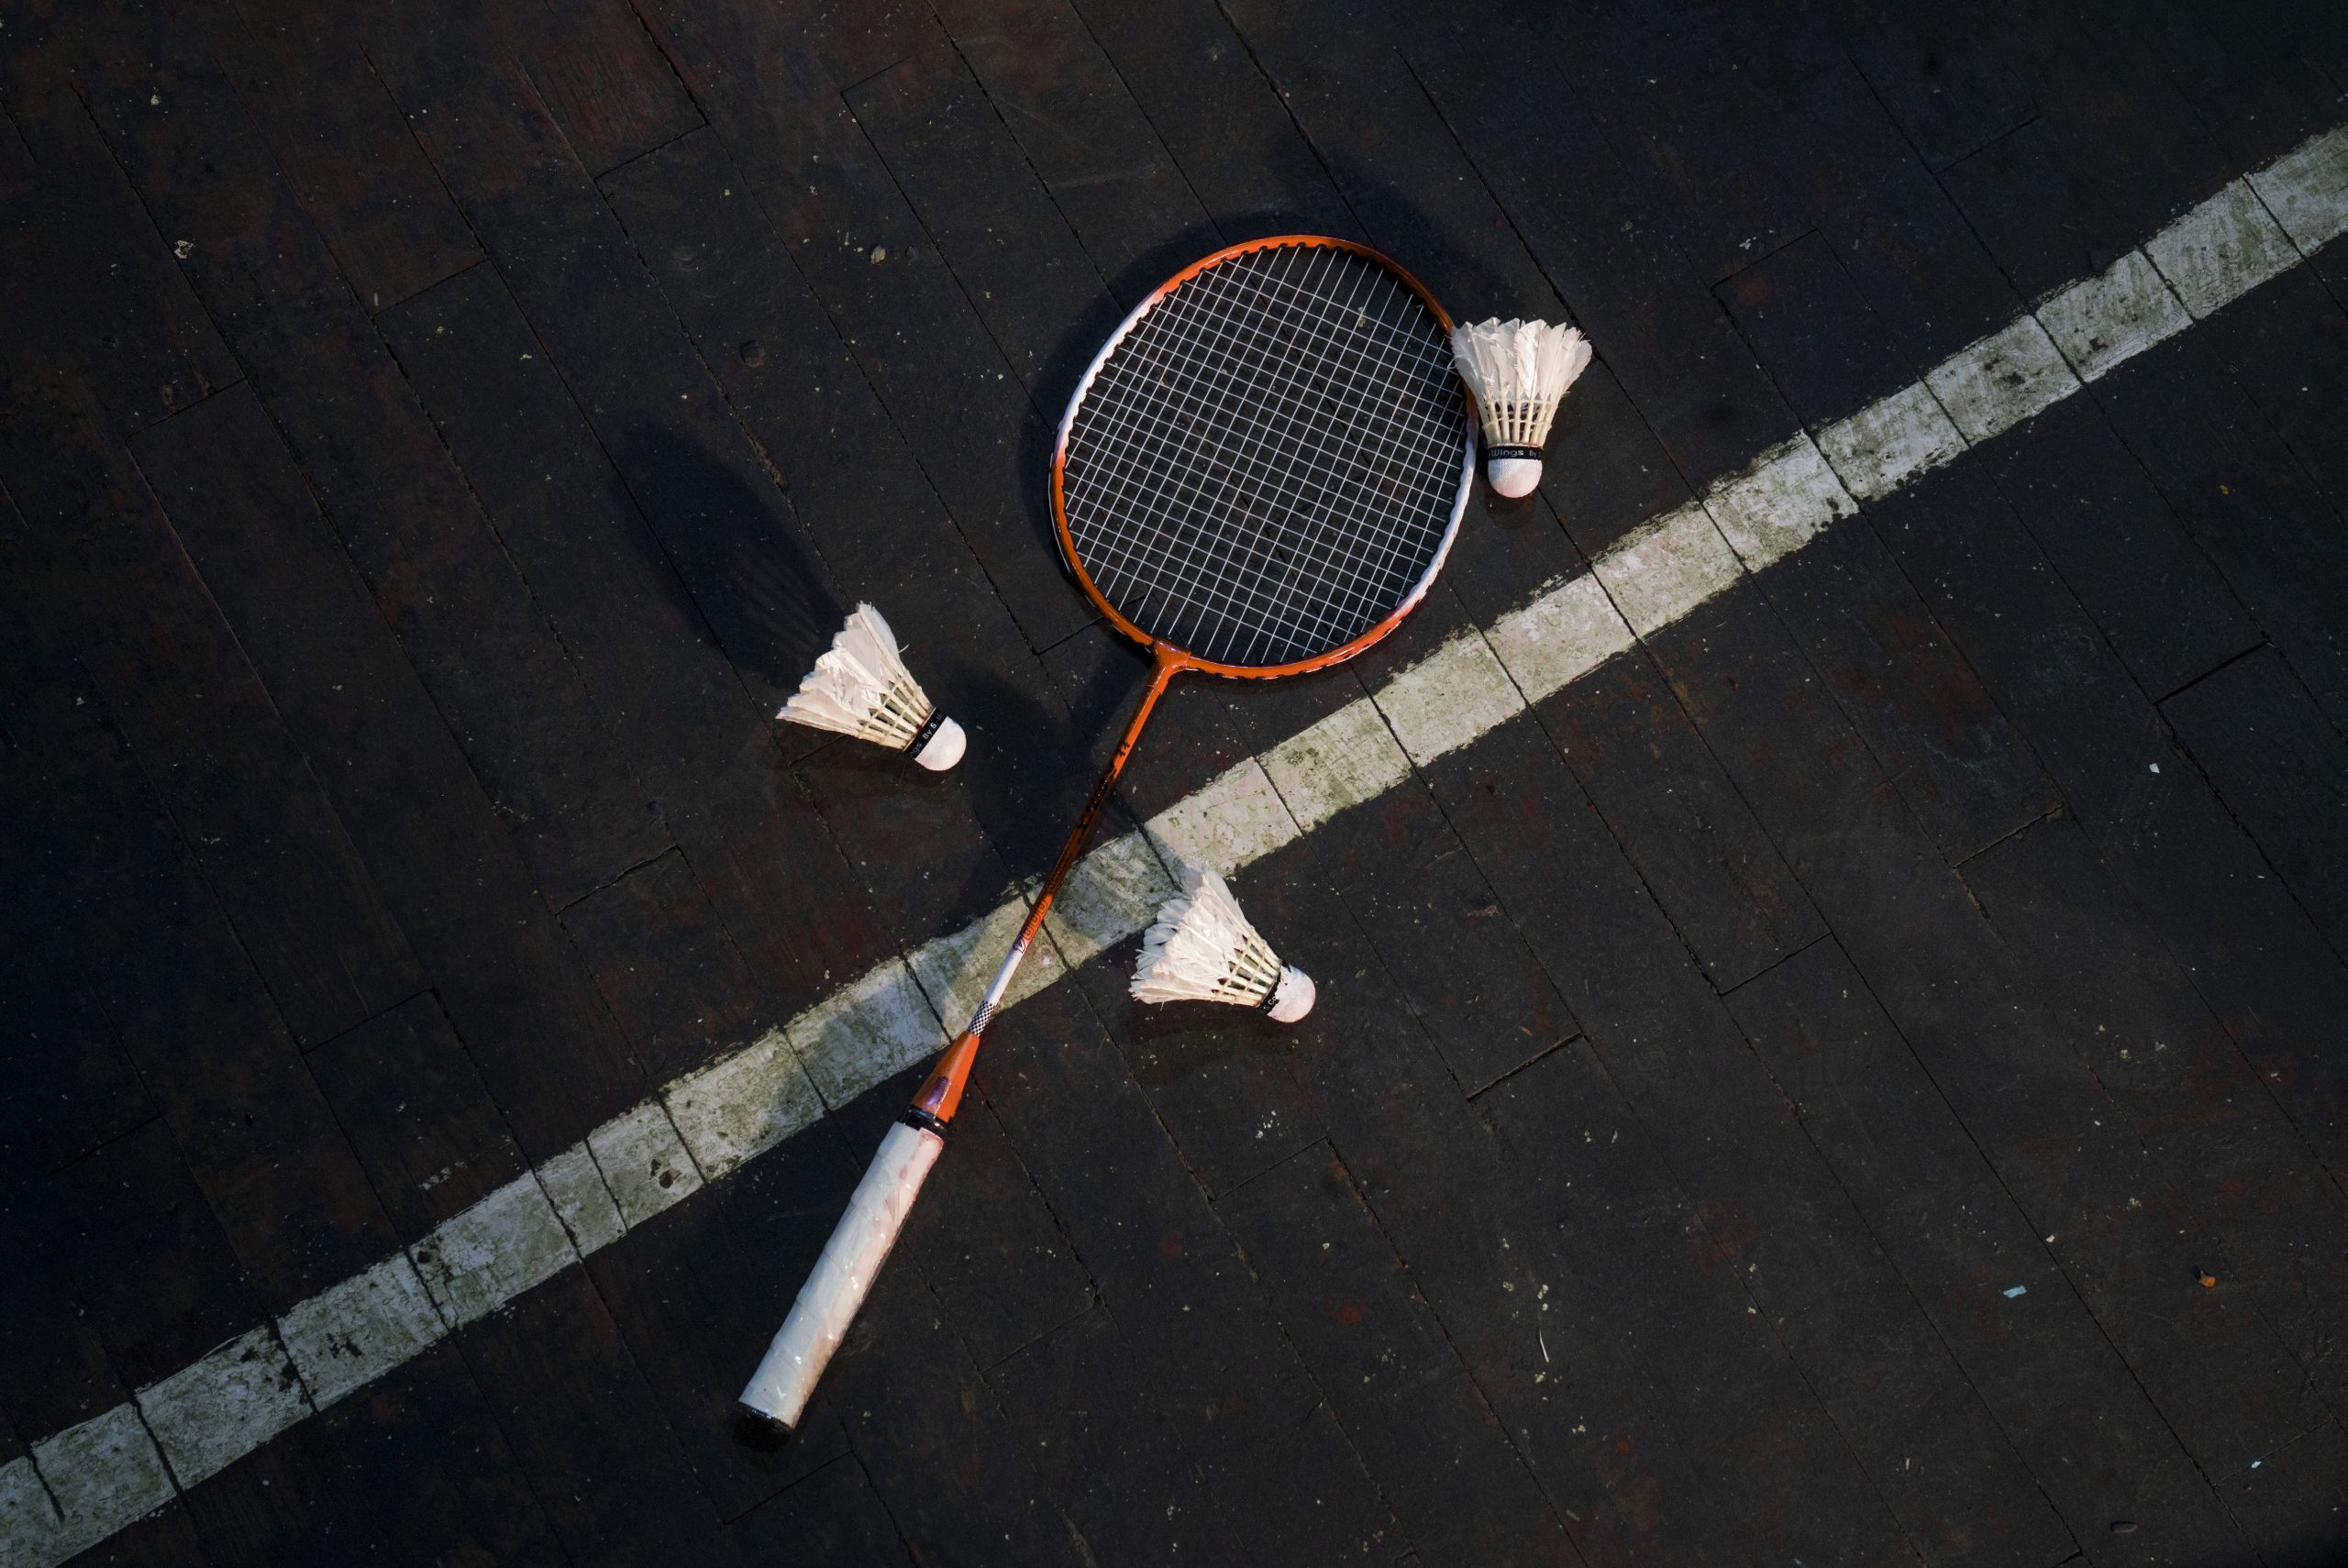 Badminton equipment on the ground